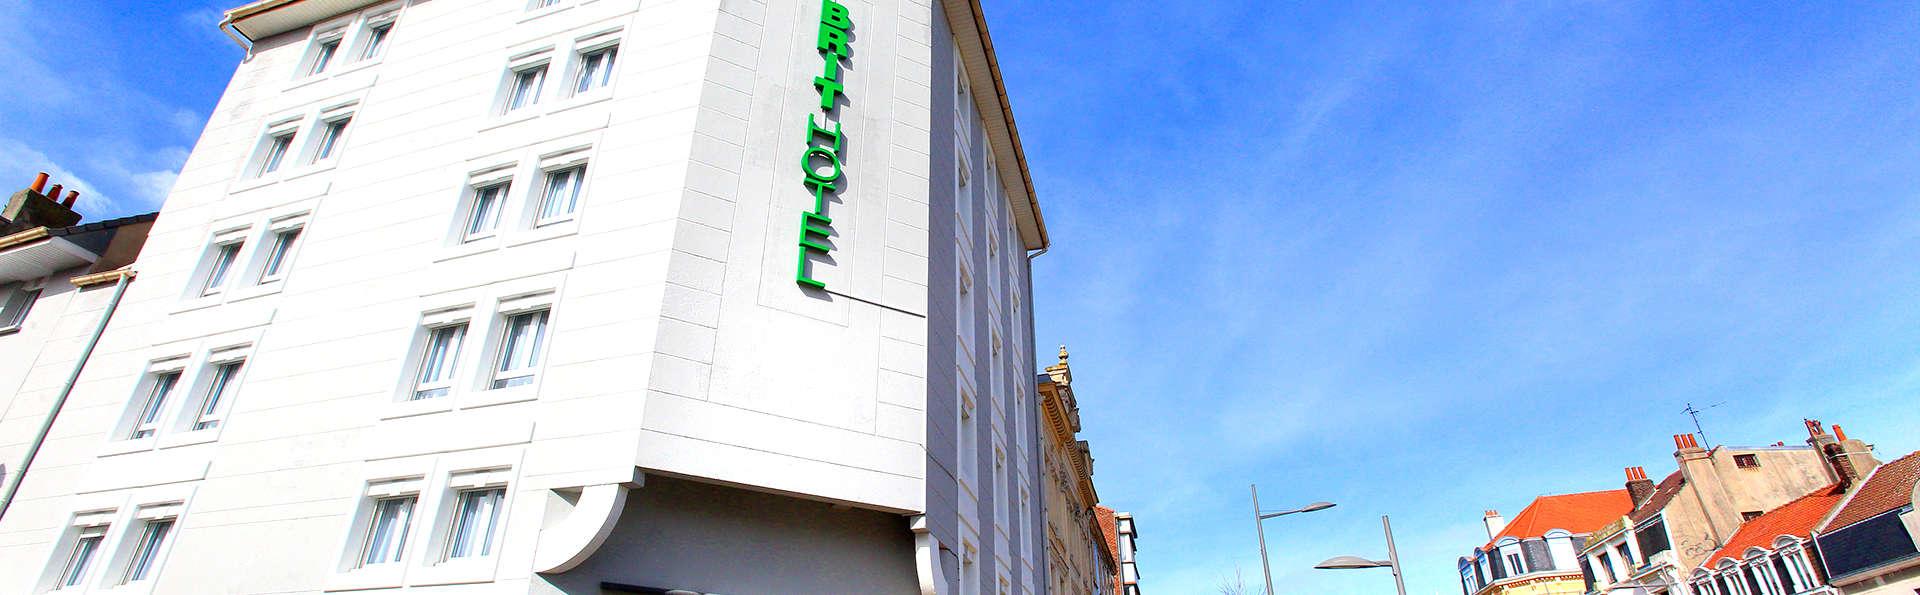 Brit Hotel Confort Calais - Edit_Front3.jpg